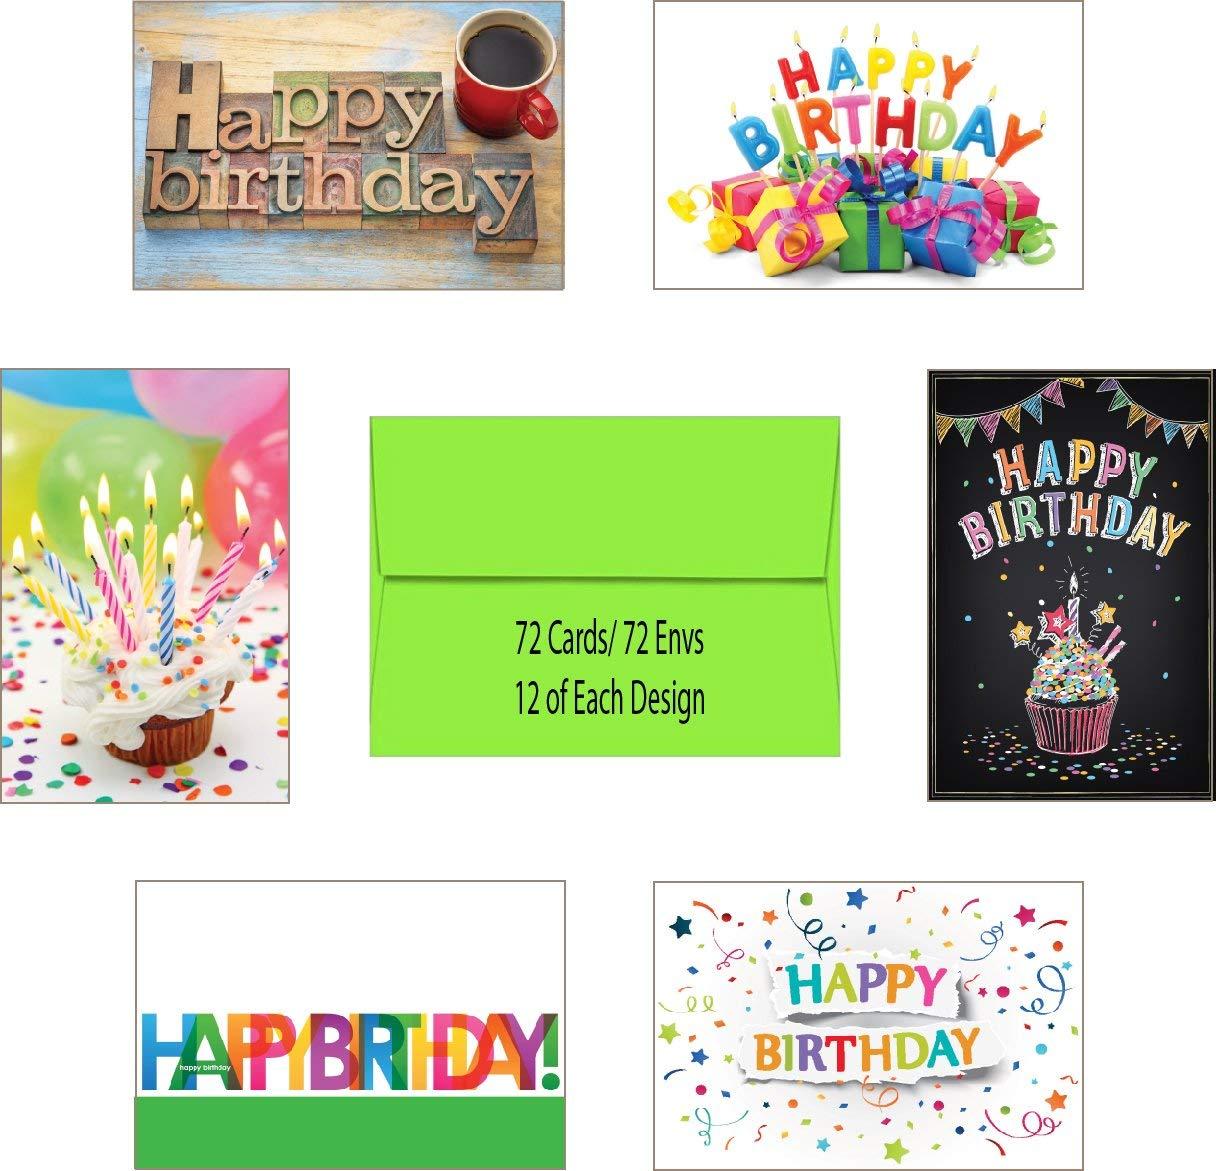 6 Designs Yellow Envs Colorful Birthday 72 Birthday Cards